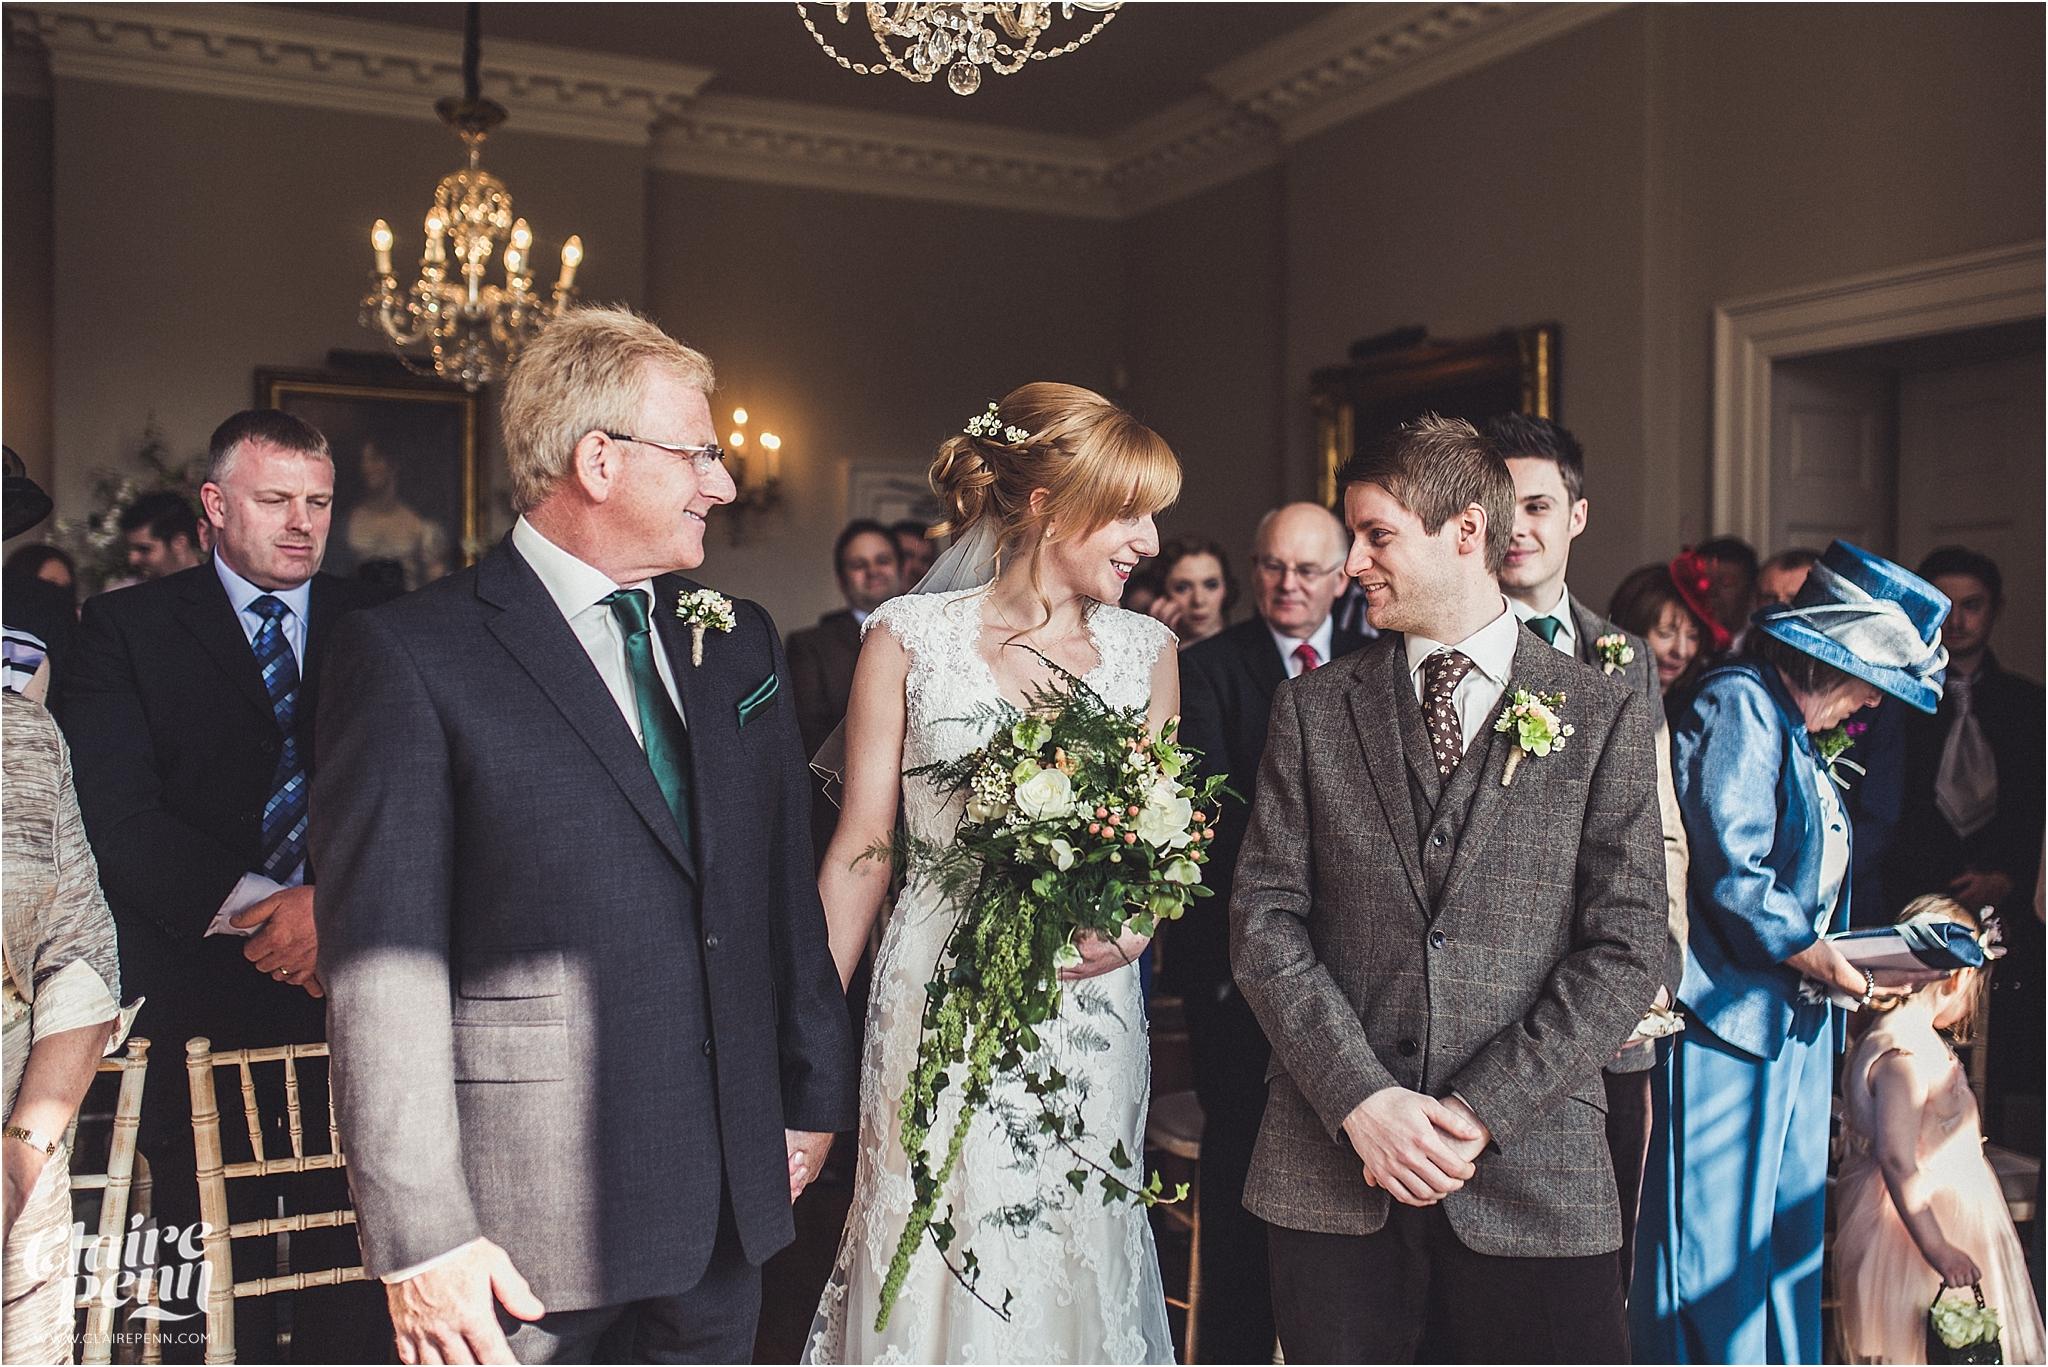 Iscoyd Park wedding, Whitchurch, Cheshire wedding photographer_0015.jpg